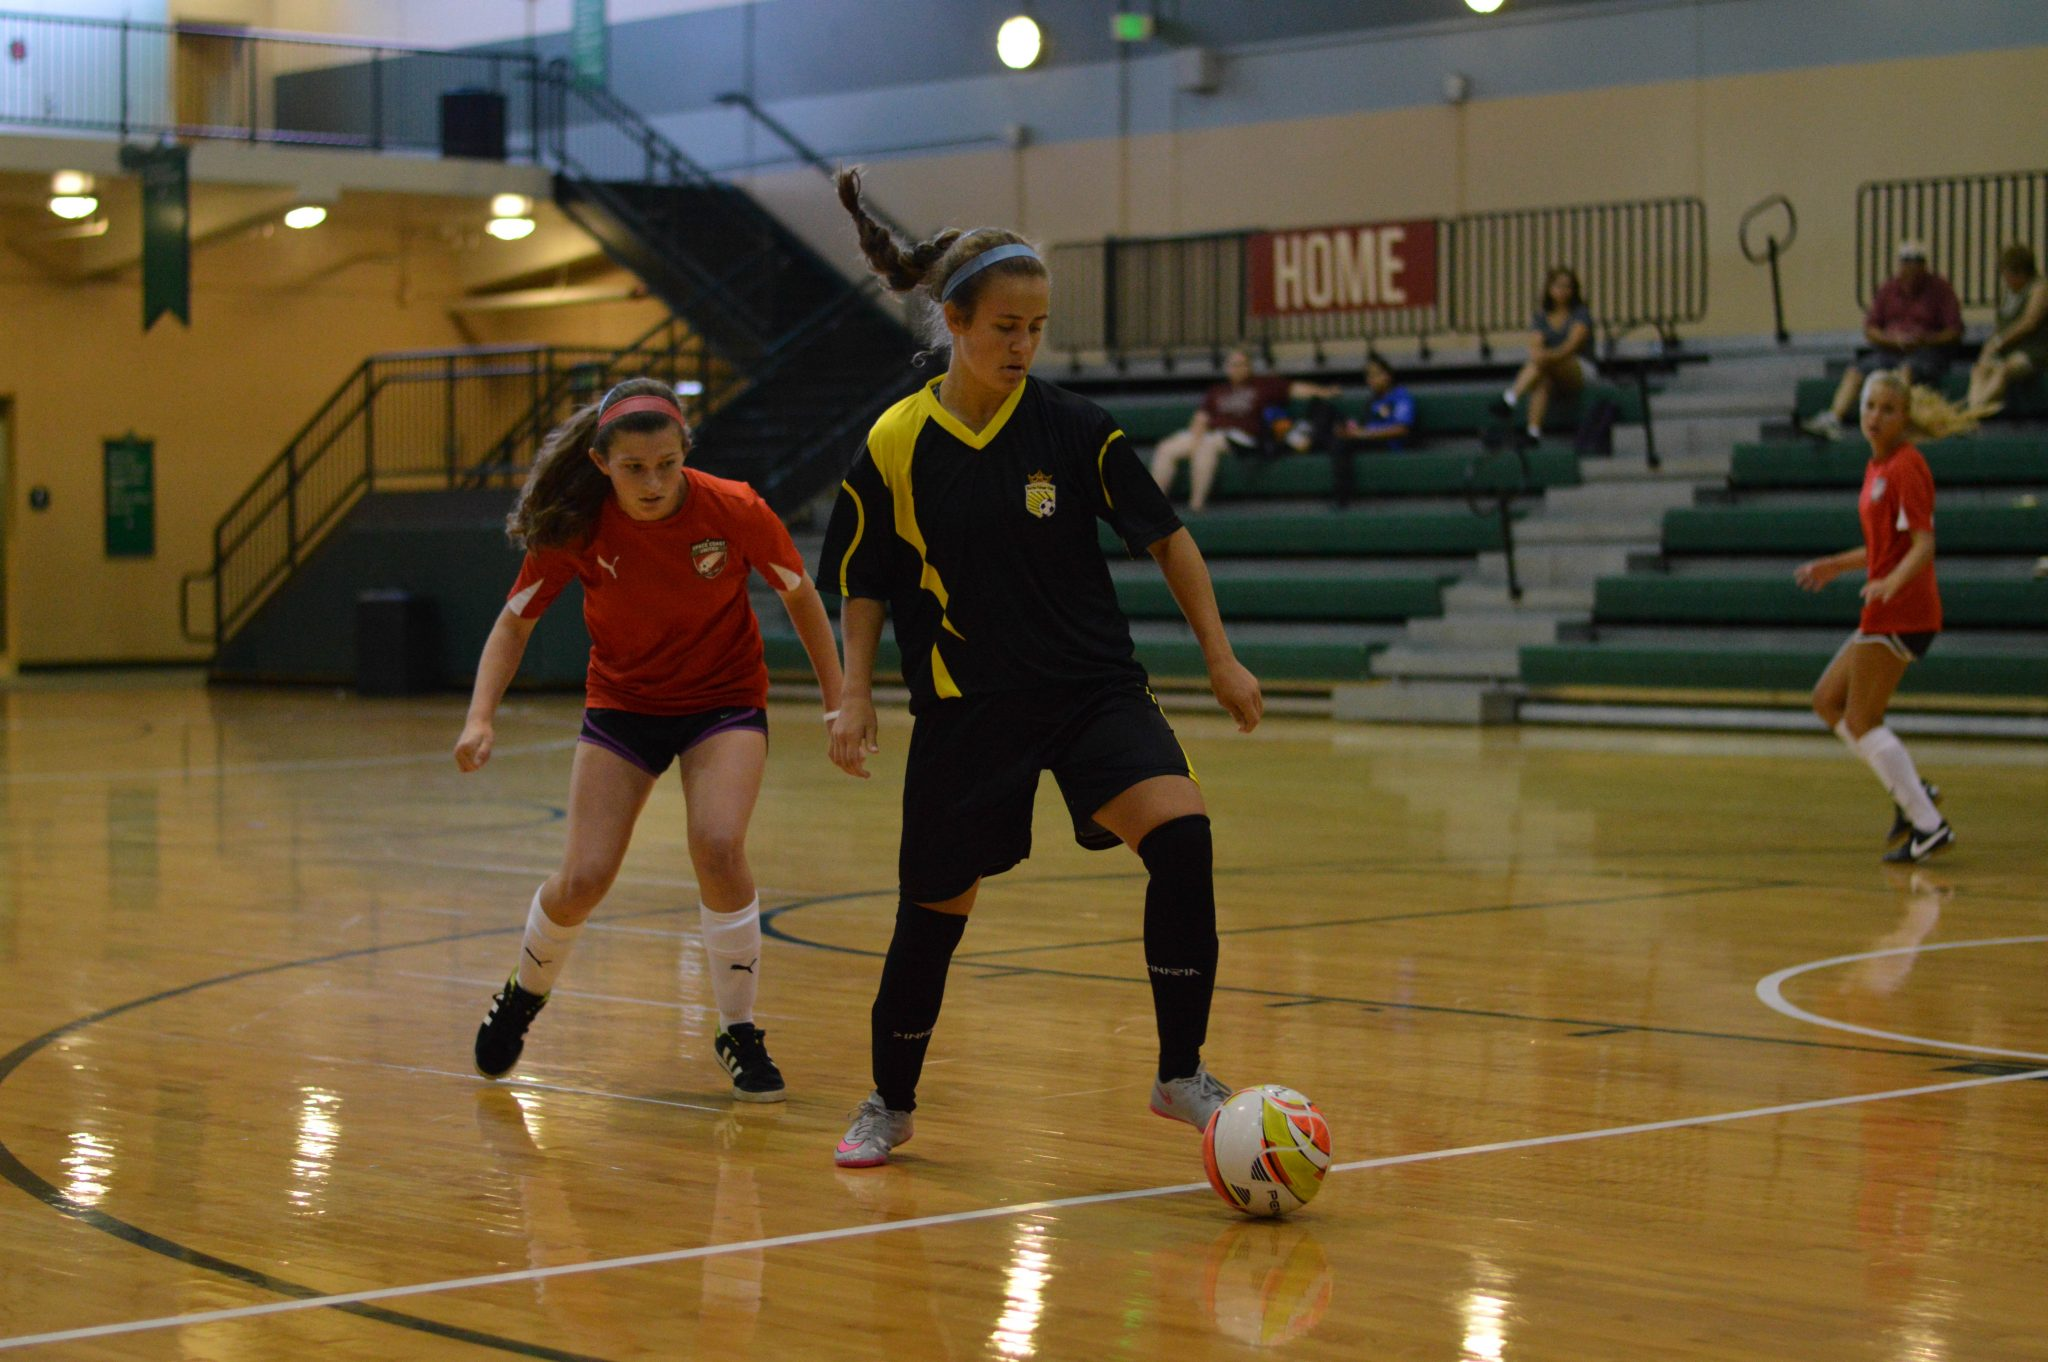 Futsal Training Exercises for Soccer Coaches